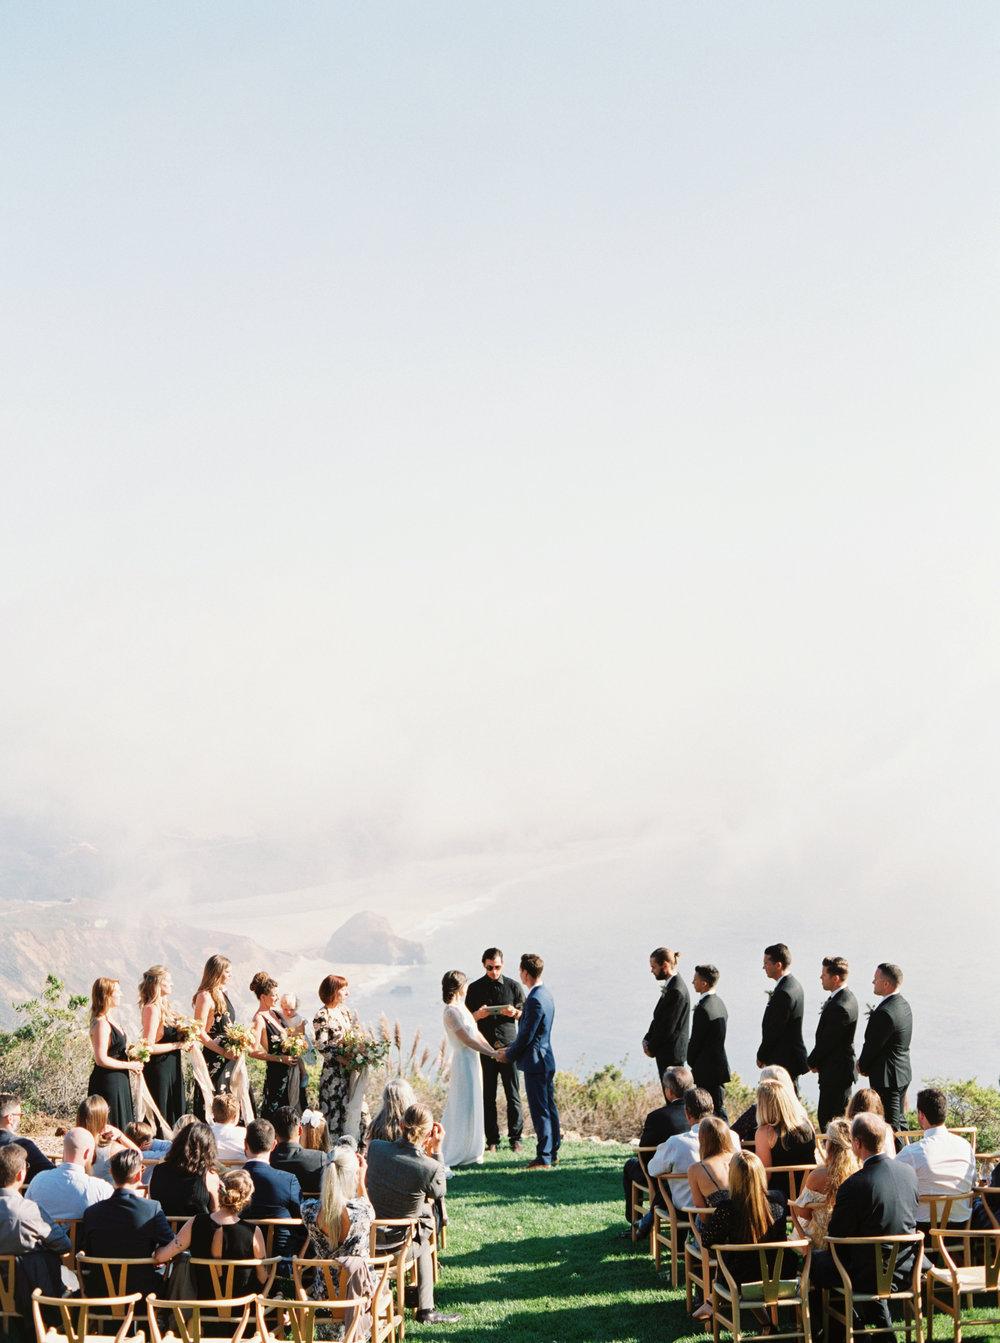 12th-Table-BIG-SUR-WEDDING-Erich-McVey-5